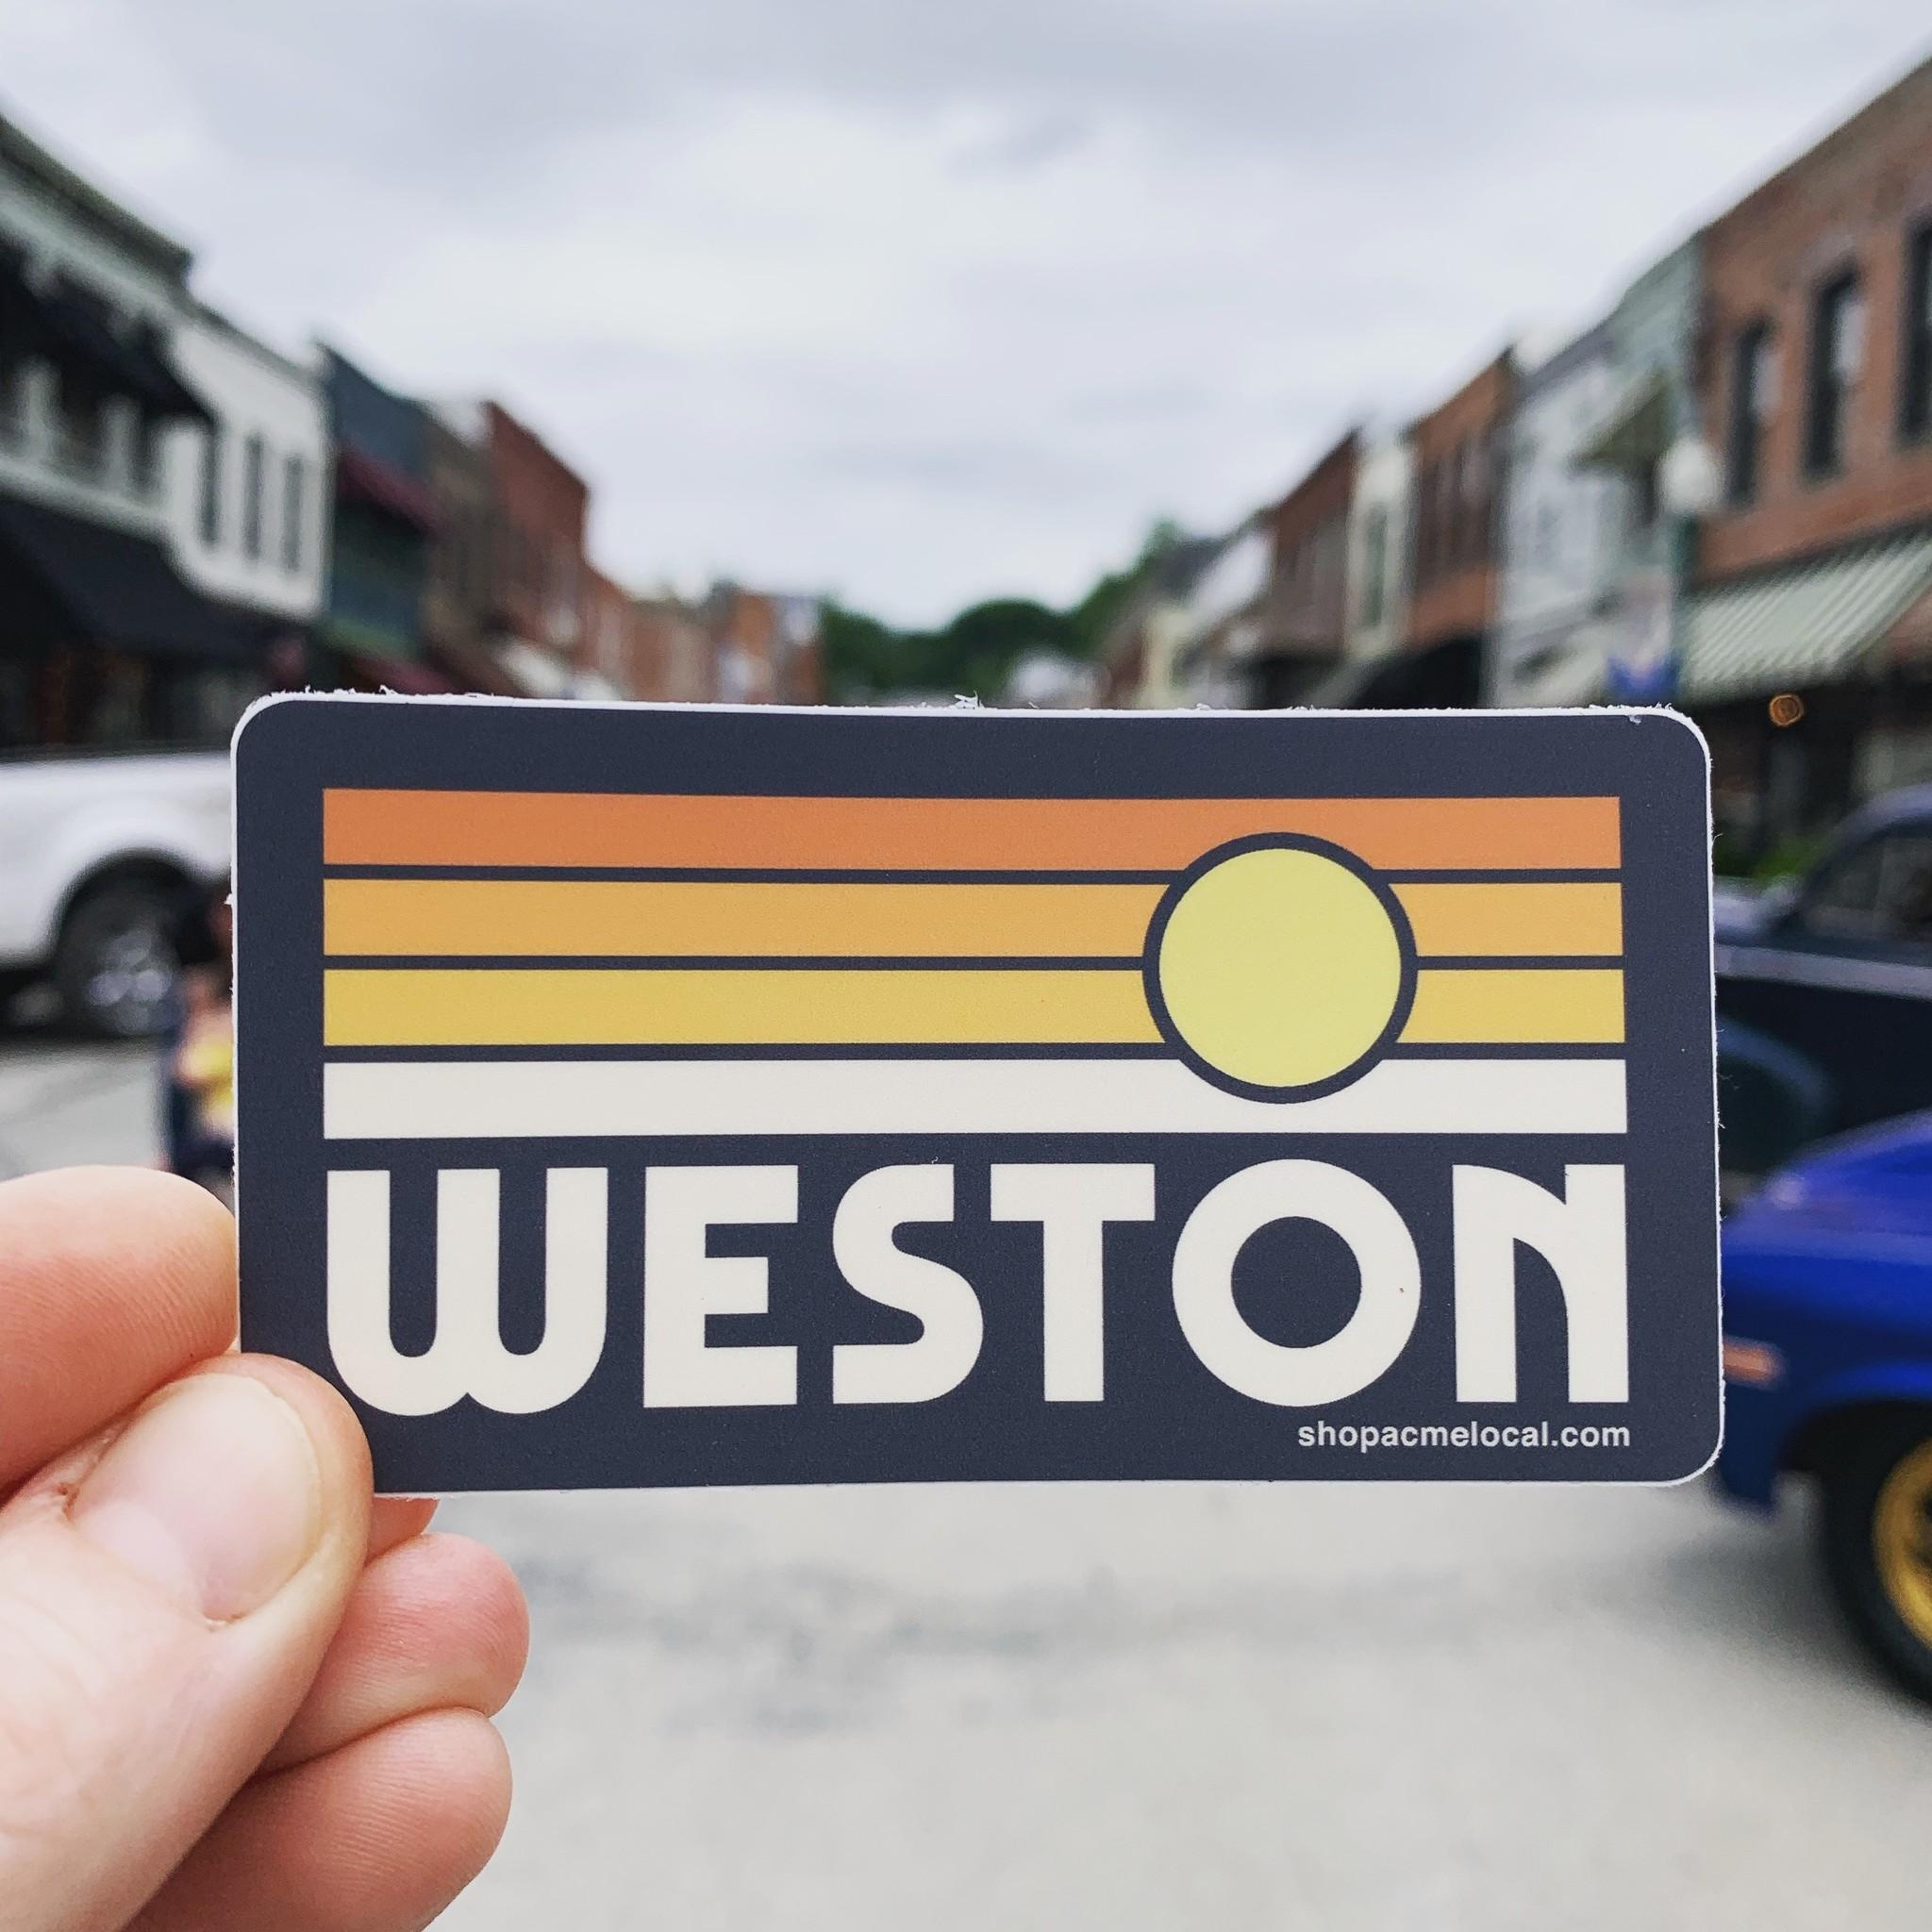 Weston Missouri - Queen of the Platte Purchase